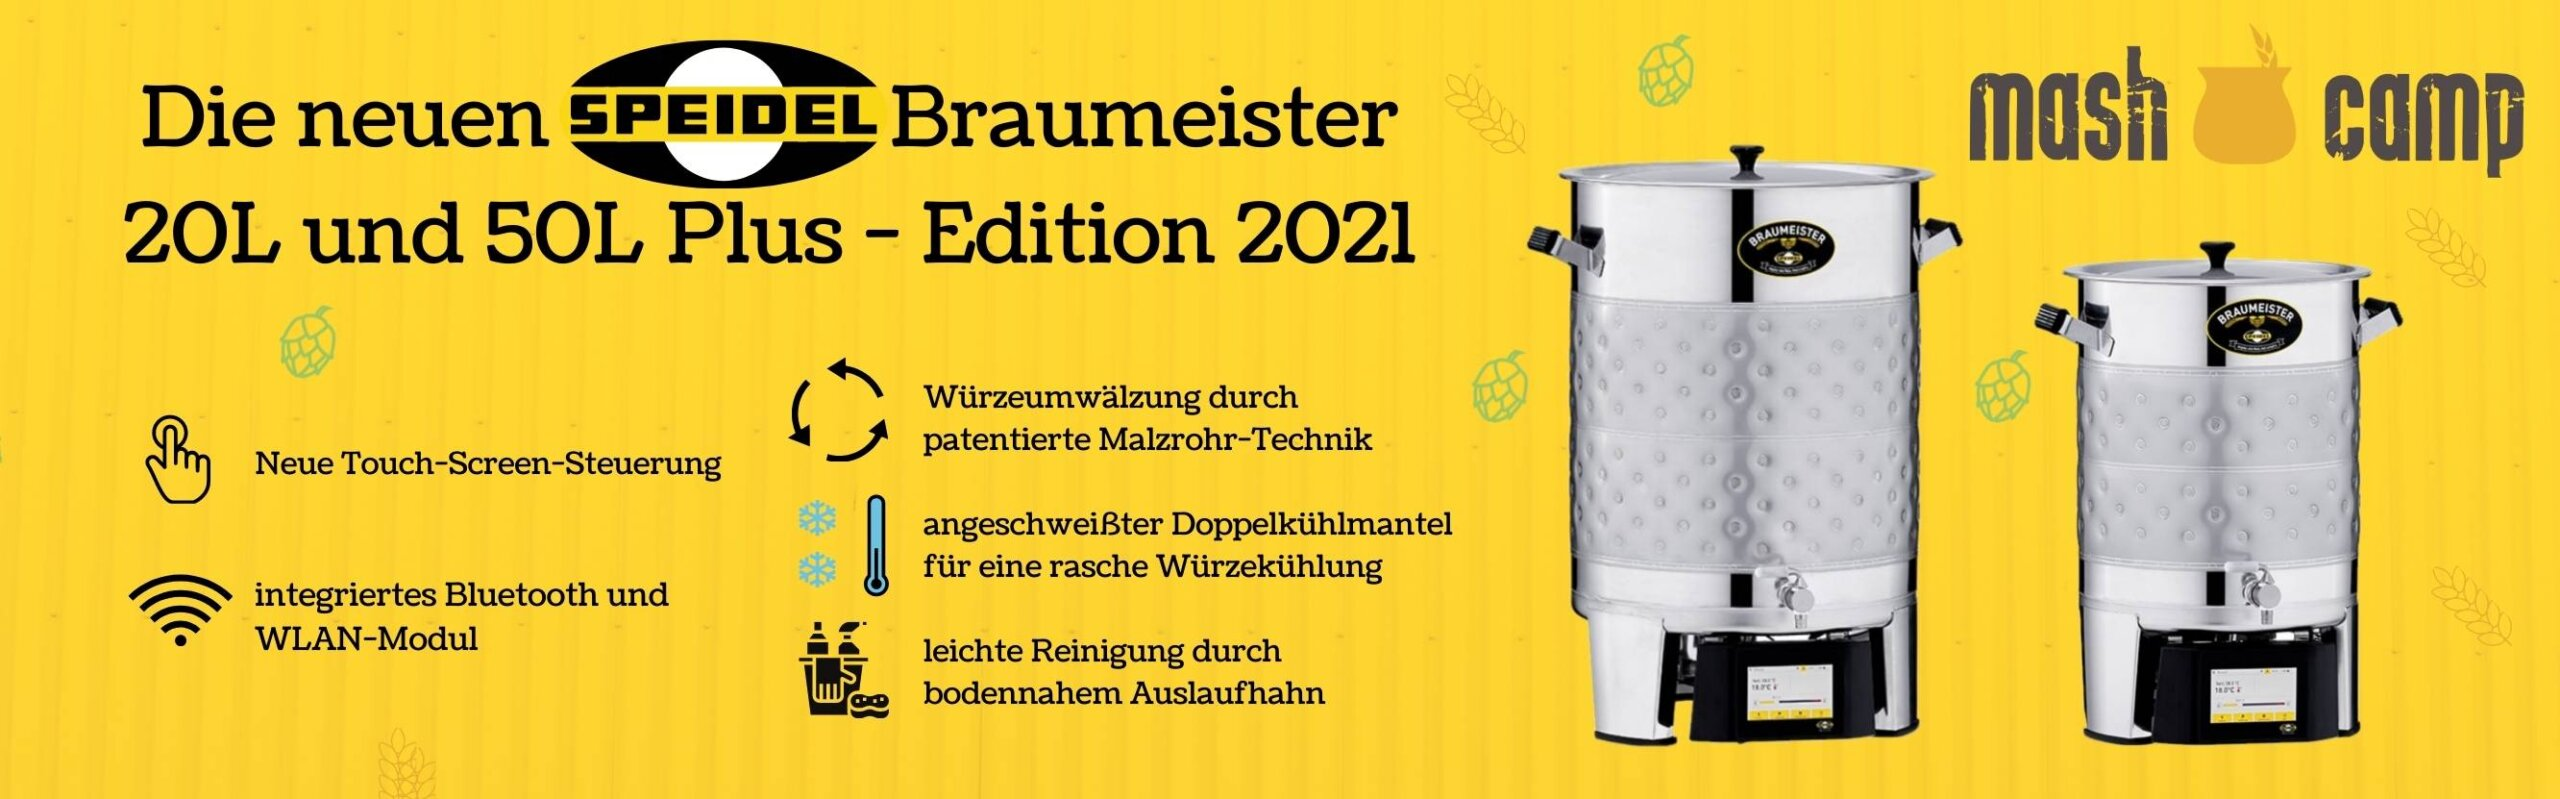 Speidel Braumeister Edition 2021